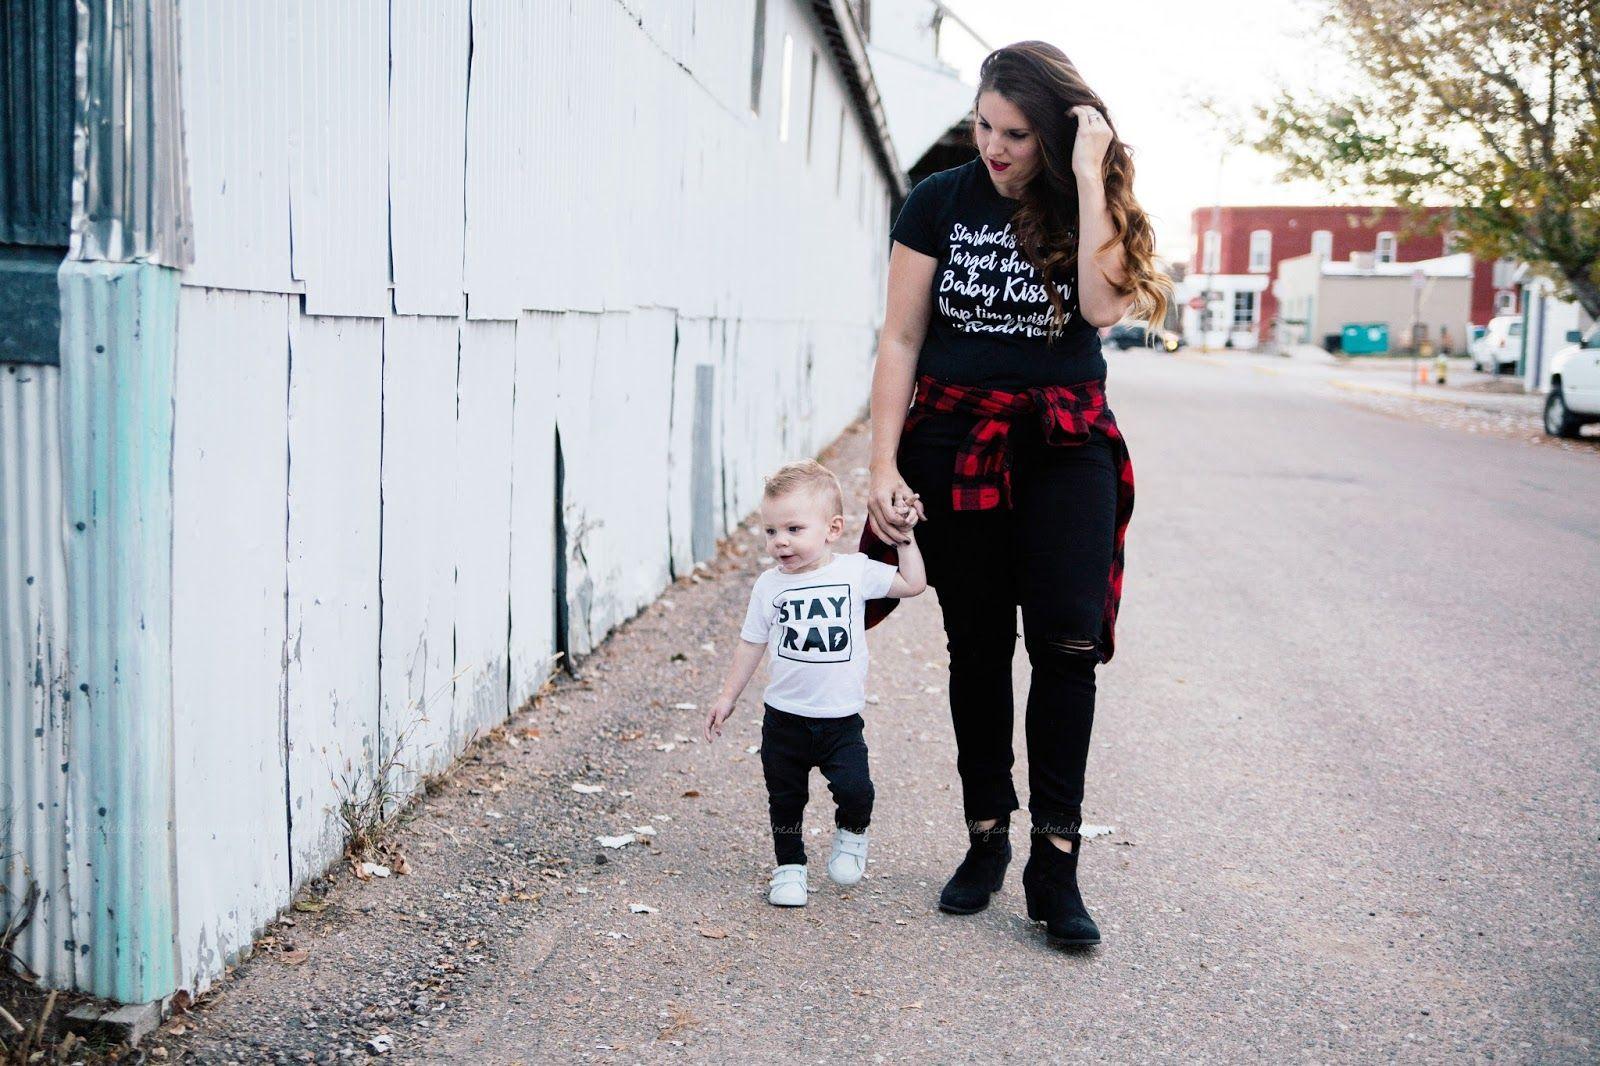 Friday Favorite | Our 5 Loves | Andrea LeBeau Blog | #childrensfashion #etsy #childrensclothing #children #lifestyleblog #fashionblogger